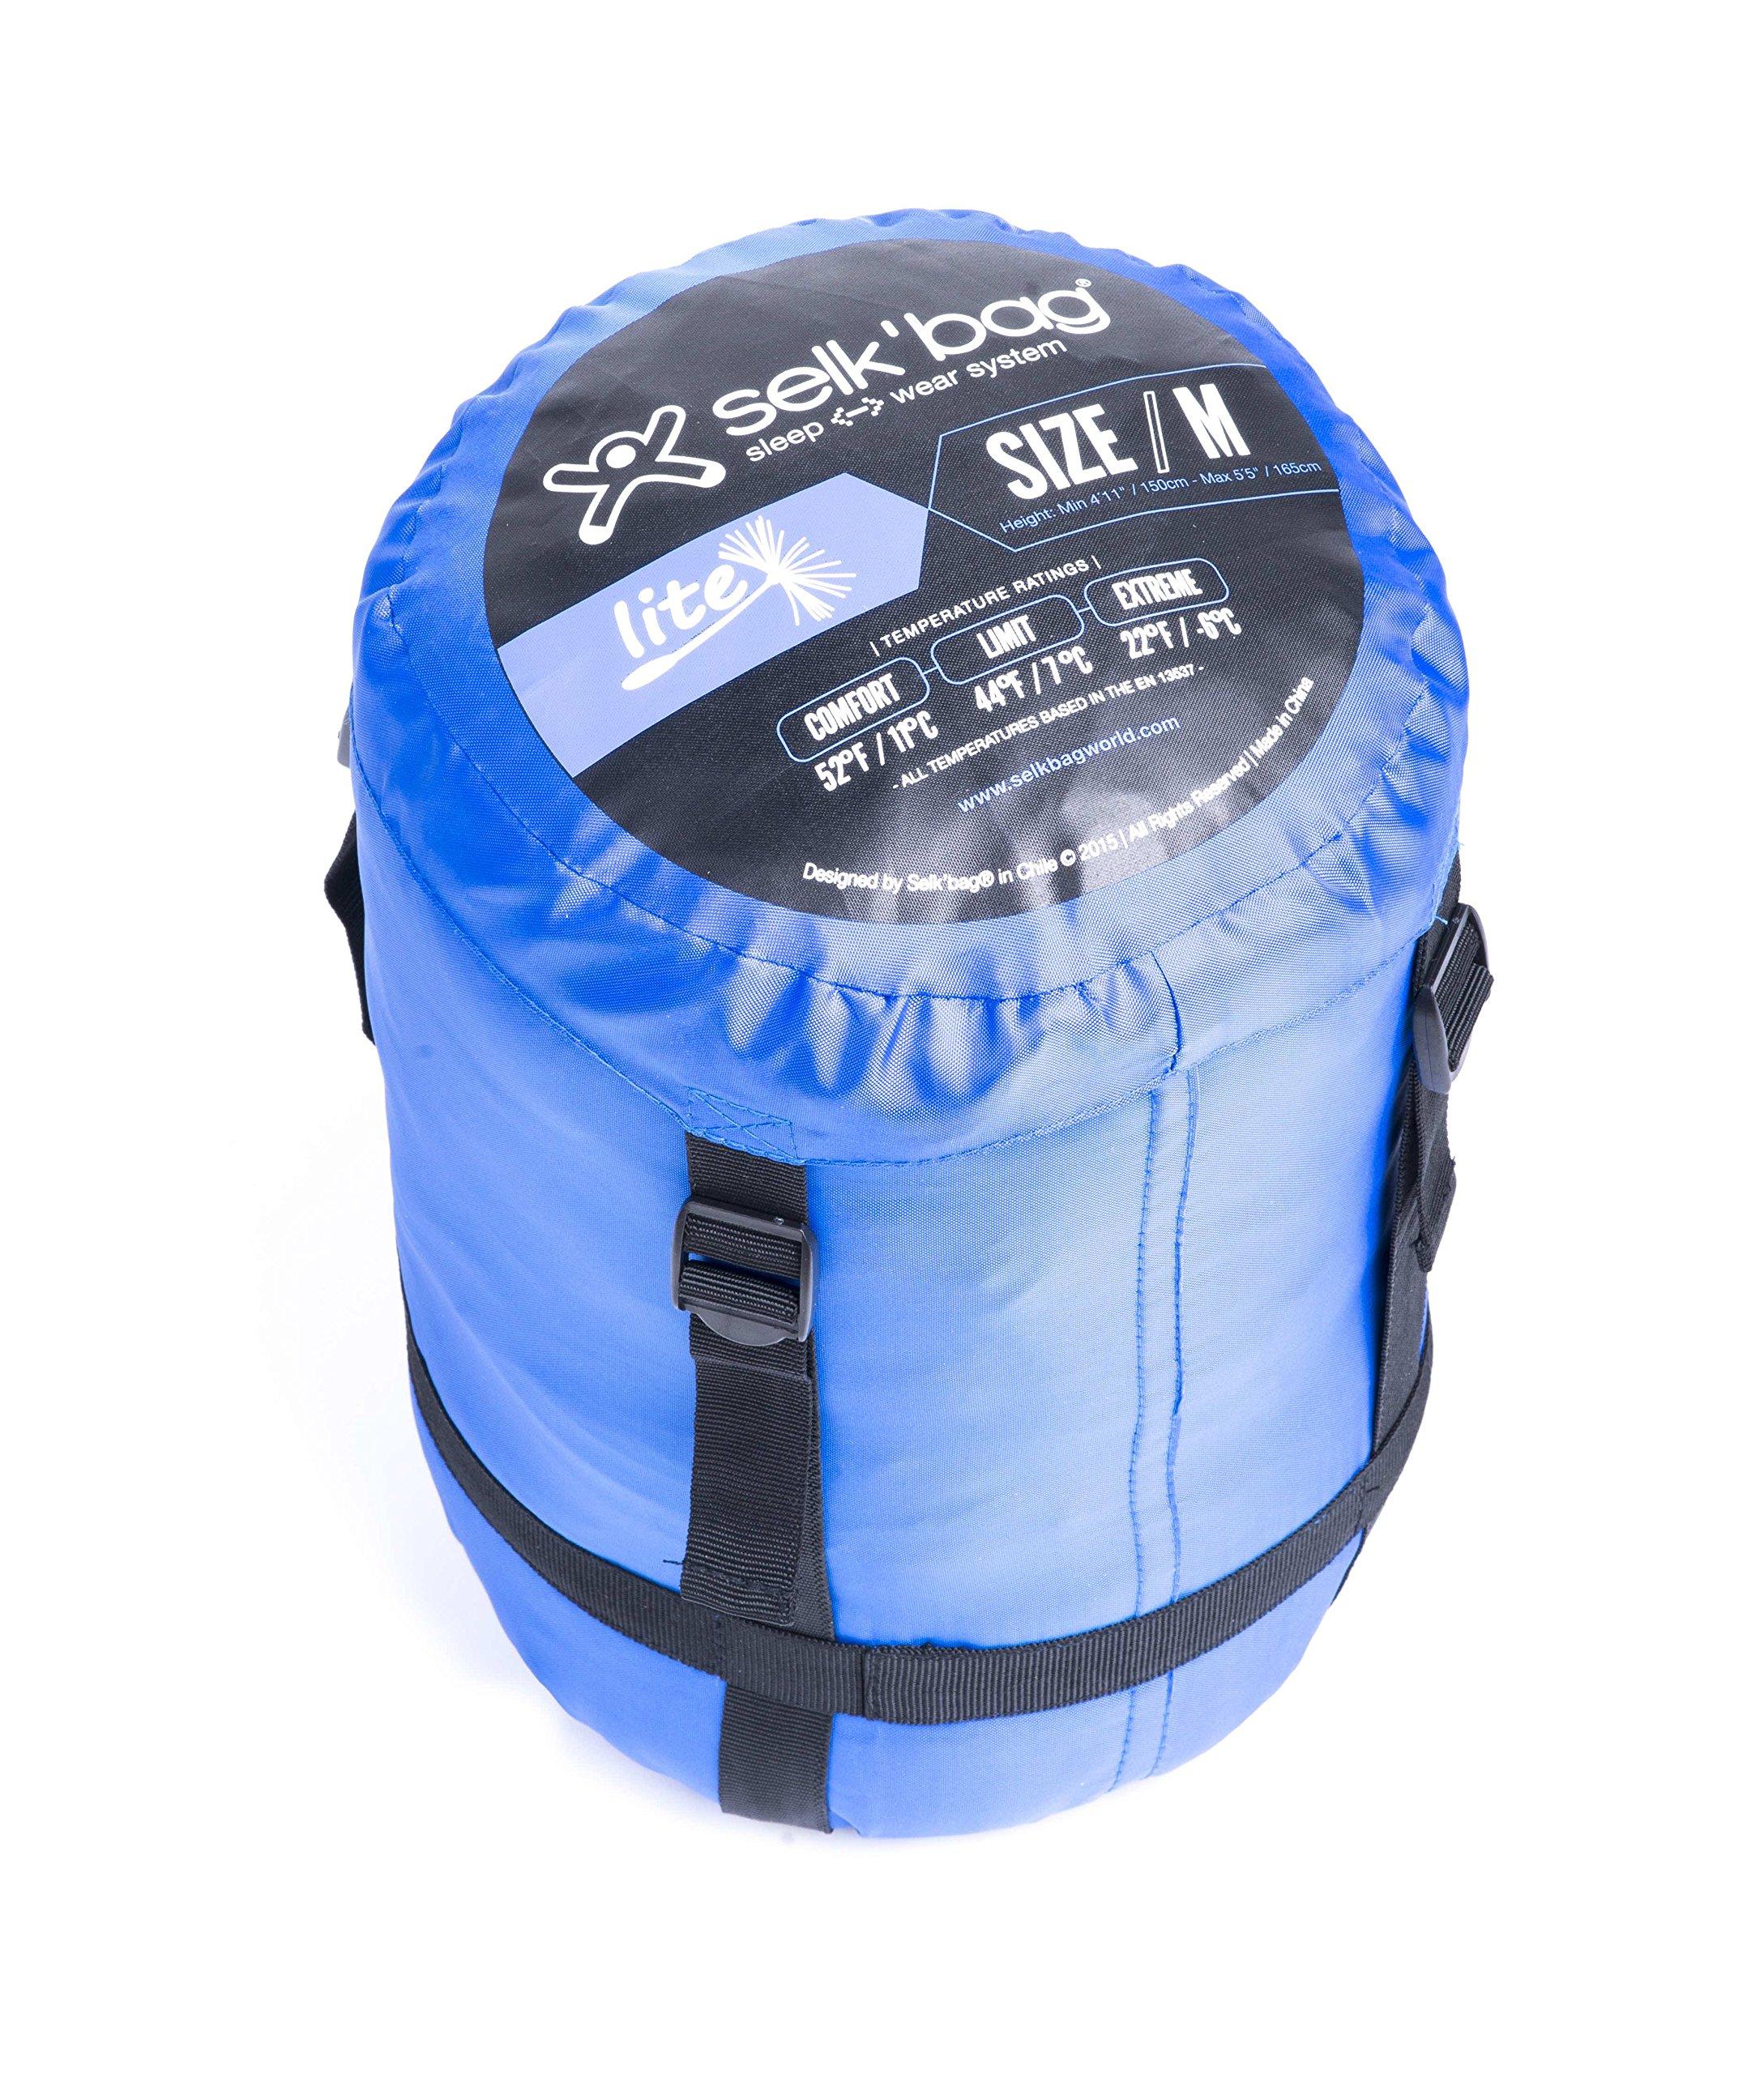 Selkbag Adult Lite 5G Sac de Couchage Portable